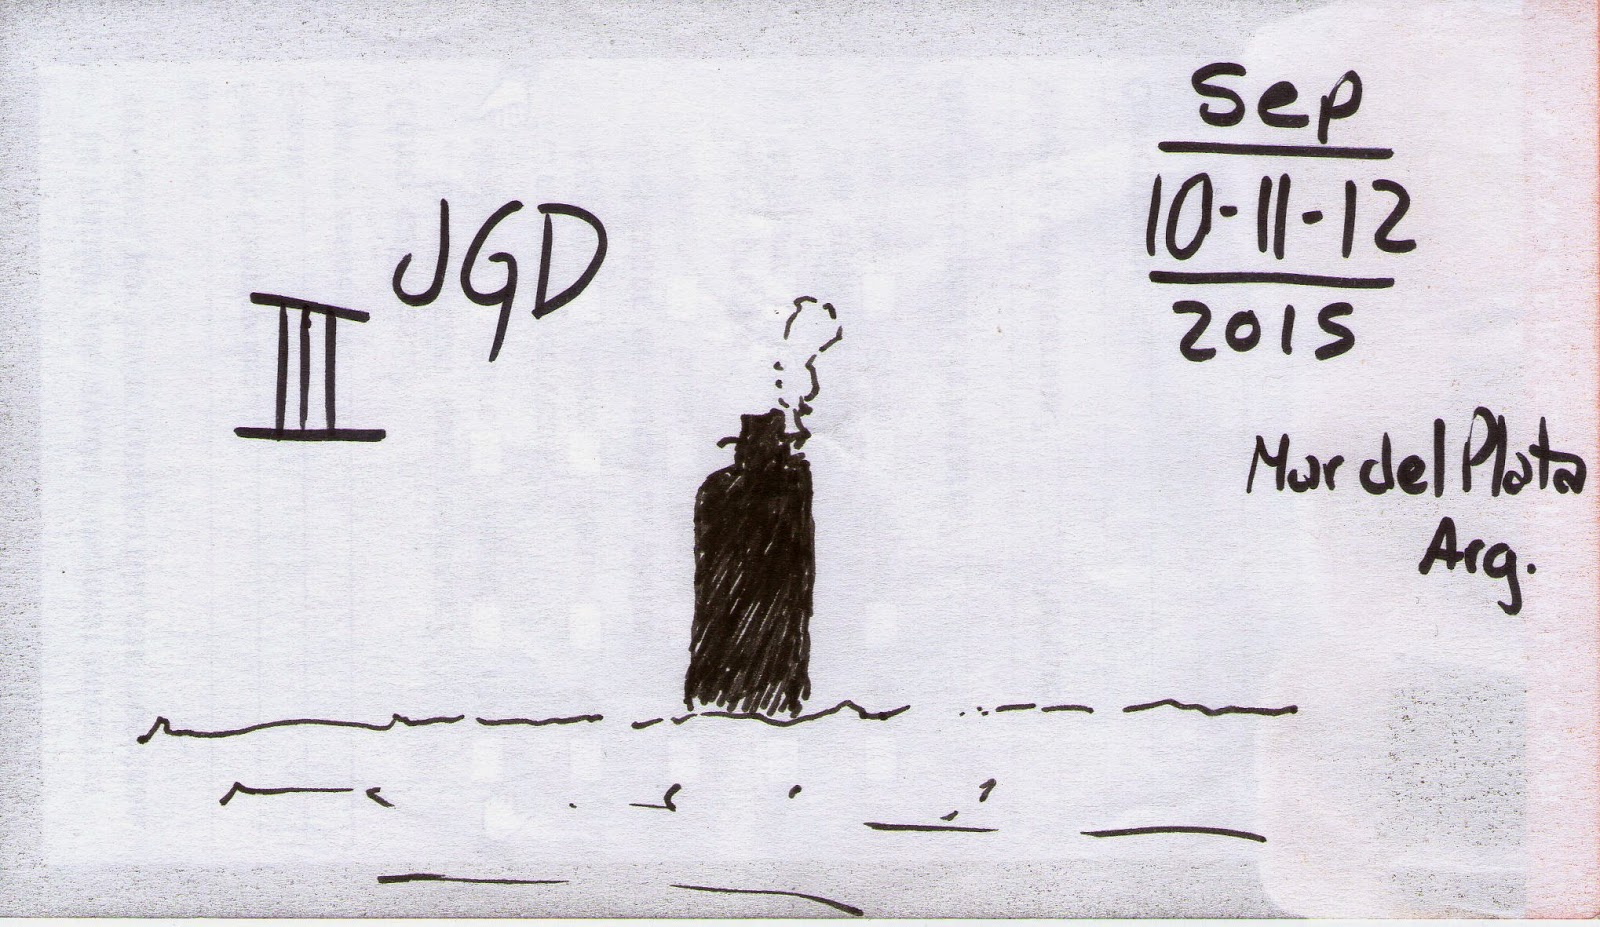 Terceras Jornadas Gilles Deleuze